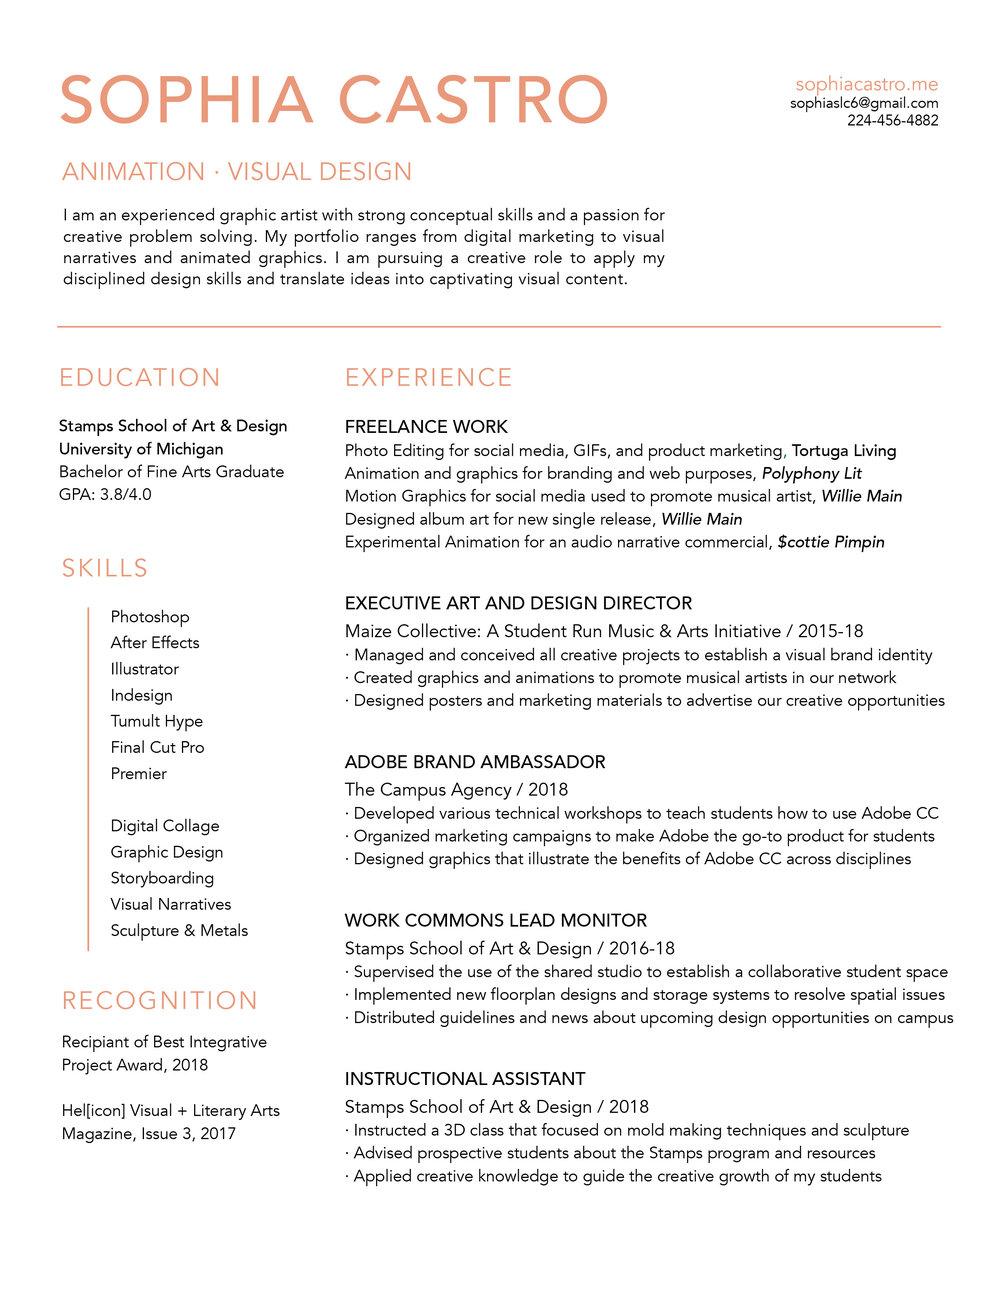 Resume_SophiaCastro-website.jpg